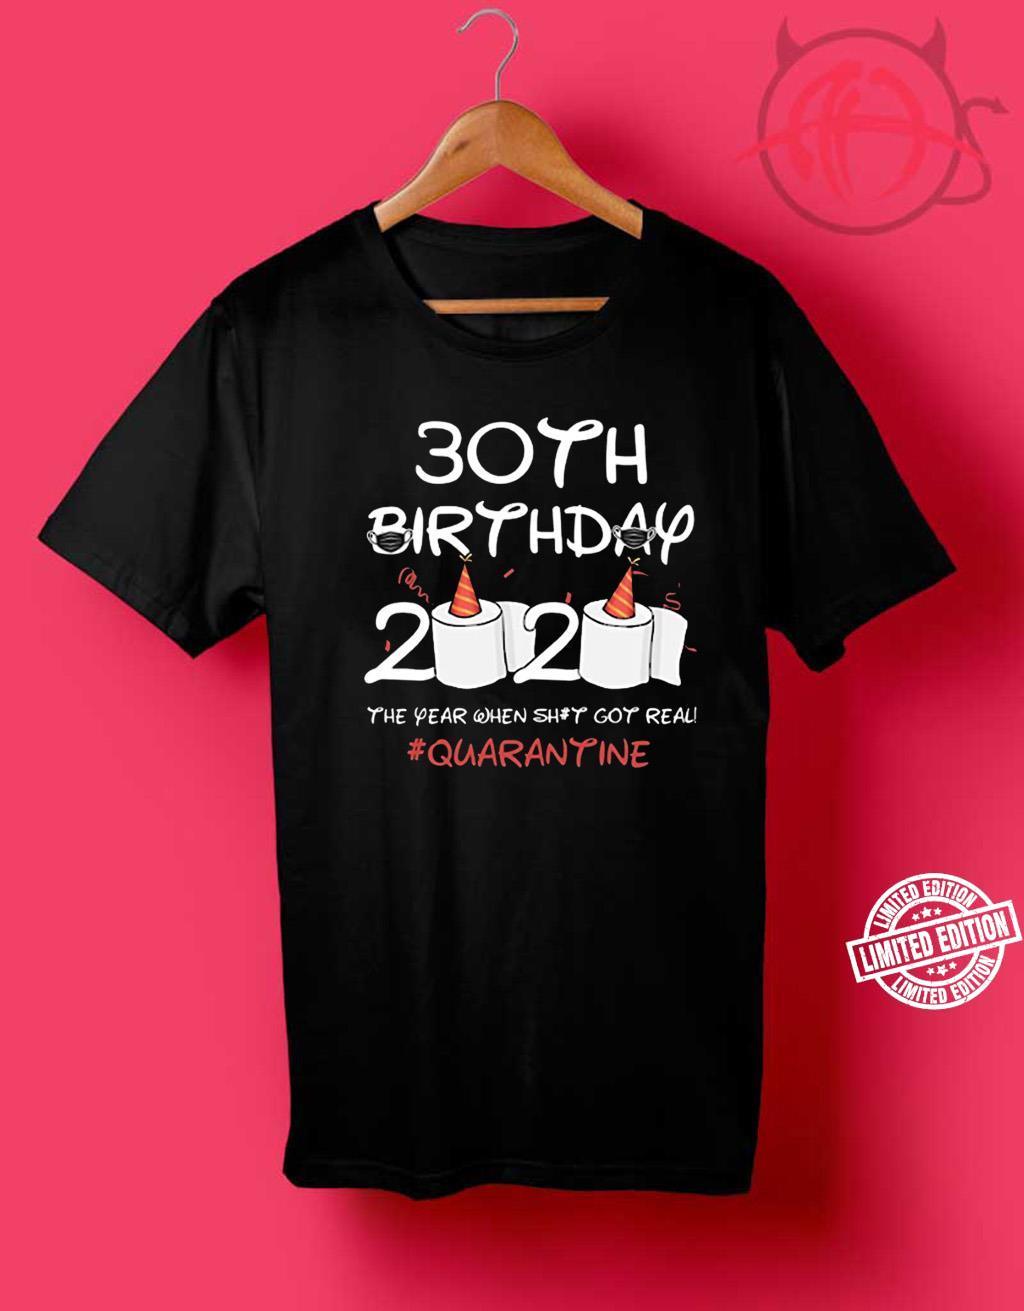 Birthday Gift 30th Birthday 2020 #Quarantine Shirt